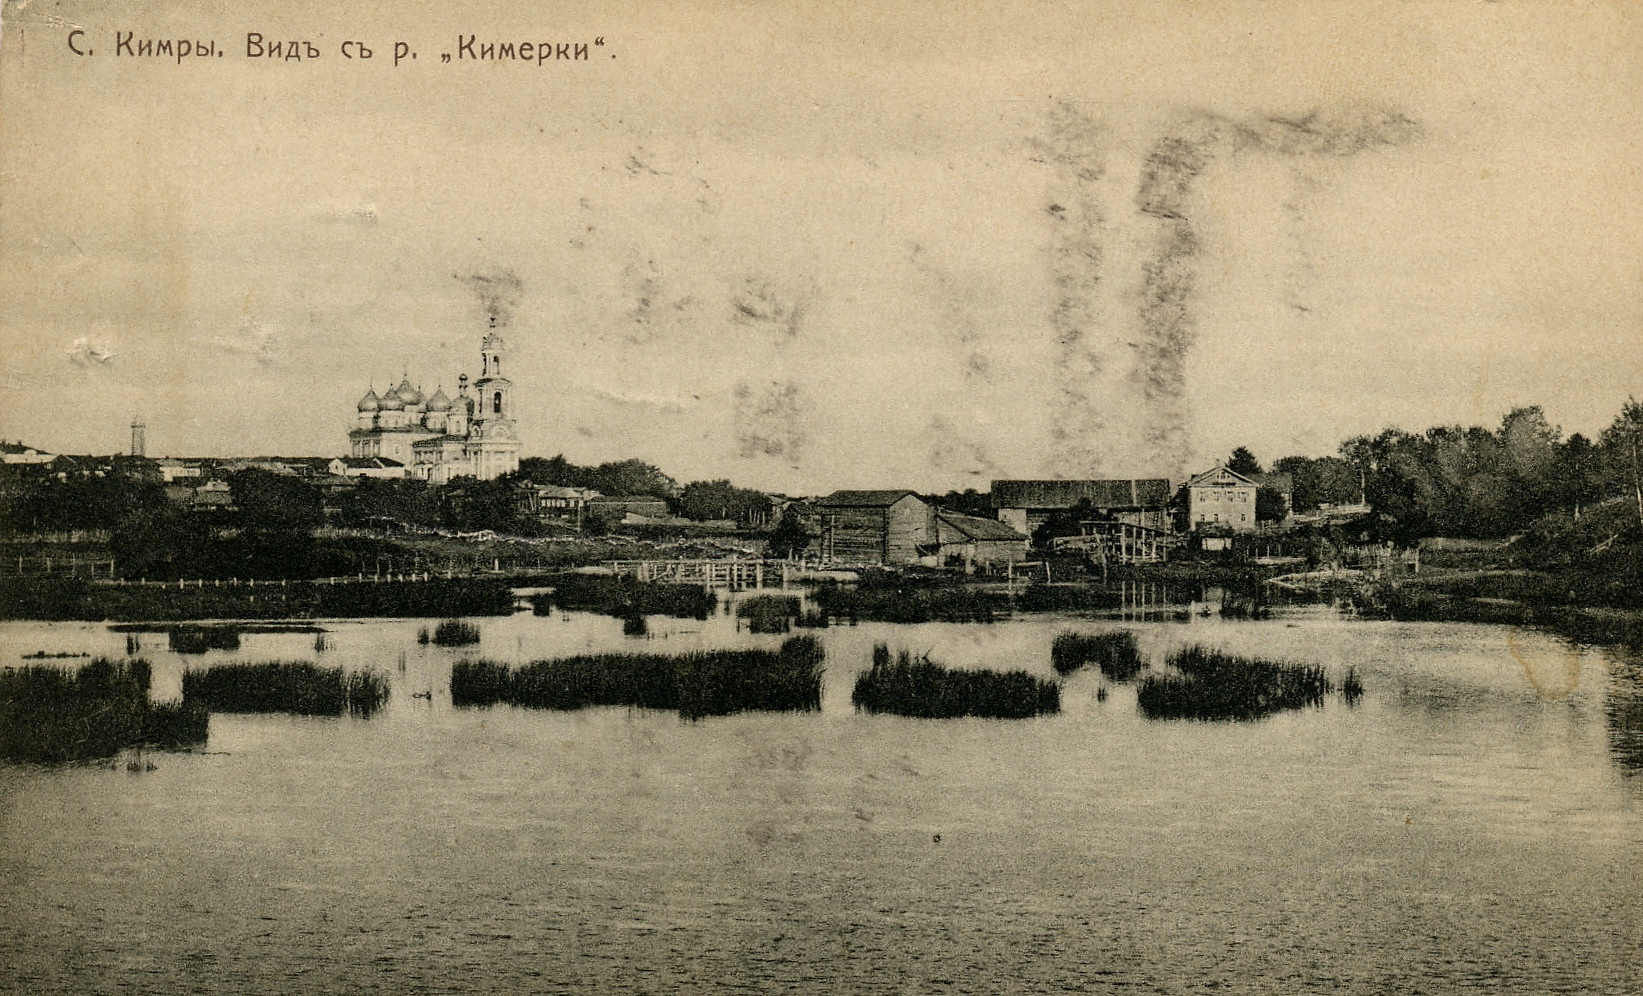 Вид с реки Кимерки